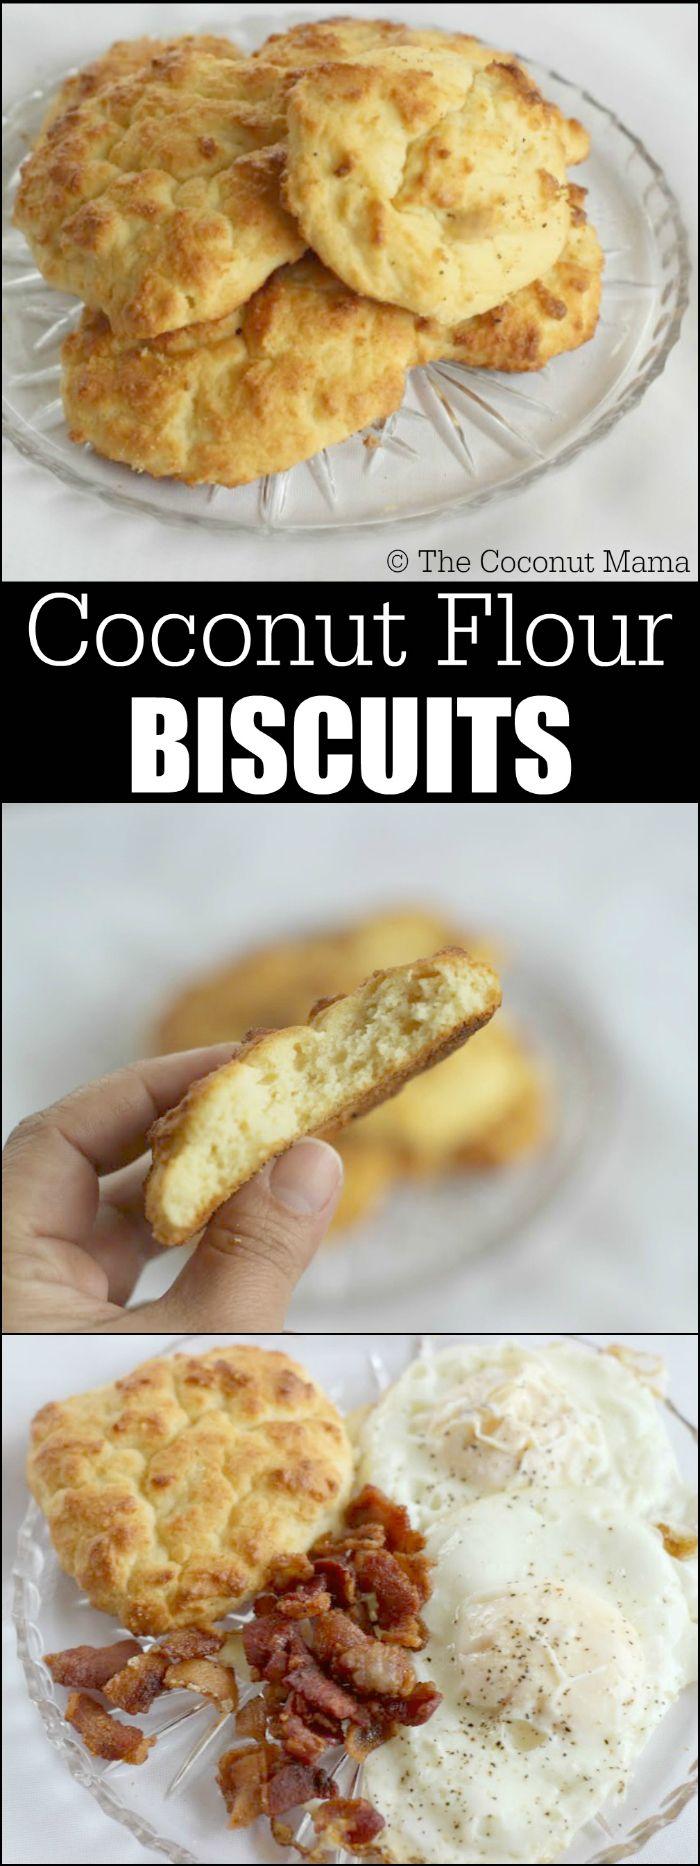 Super Healthy Low Carb Coconut Flour Biscuits